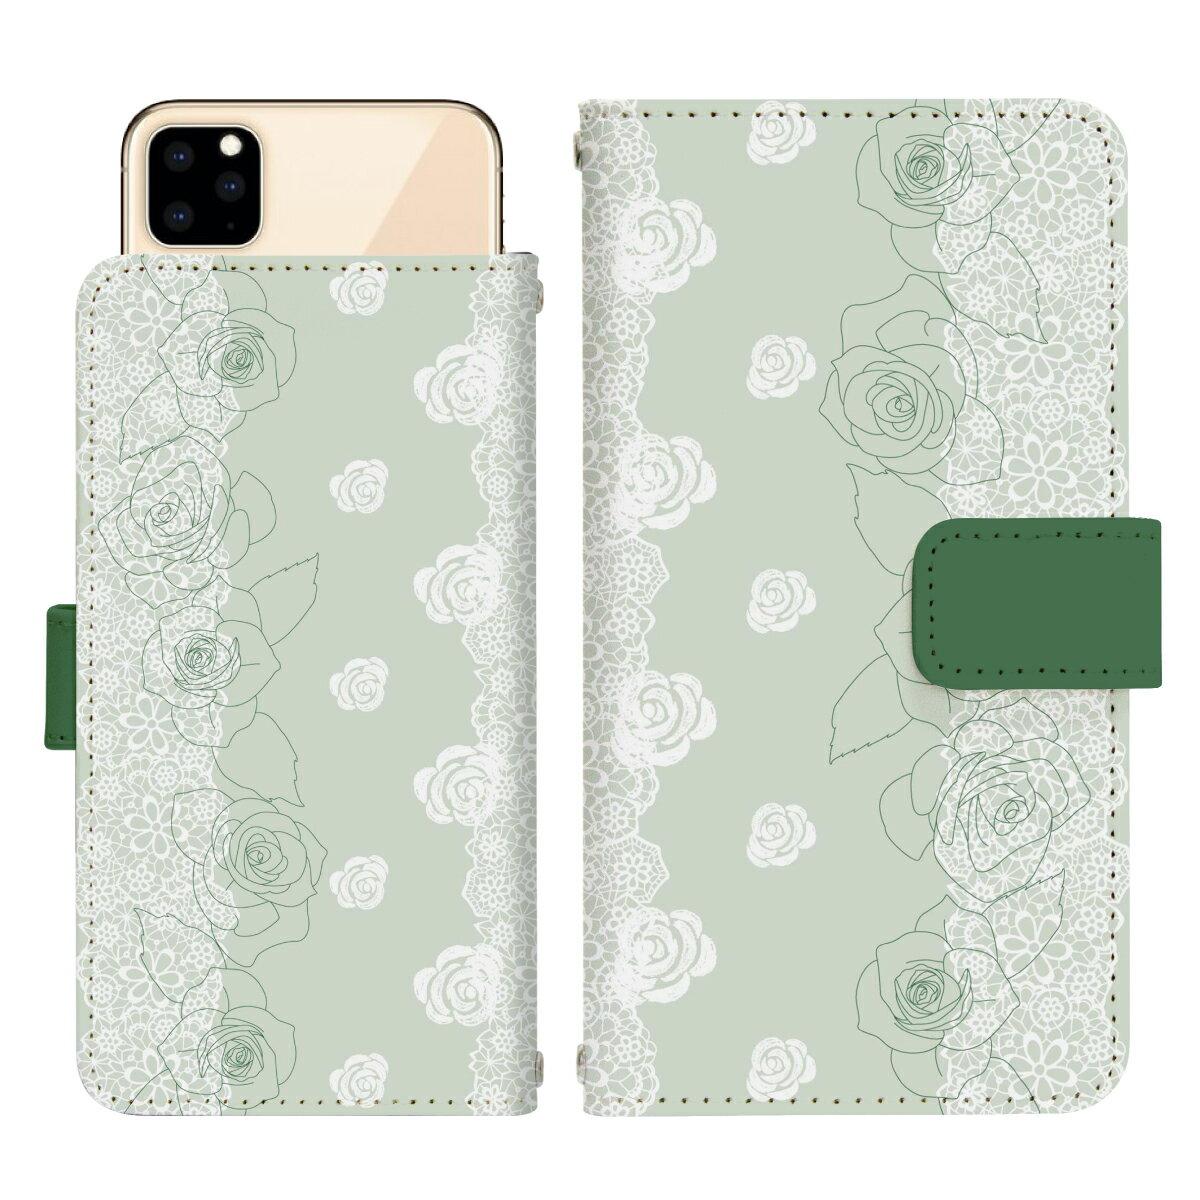 Galaxy Note10 スライド 手帳型 スマホケース スマホカバー ギャラクシー スマートフォン スマートホン 携帯 ケース ギャラクシーノート10 galaxy ケース ギャラクシー ケース dslide171